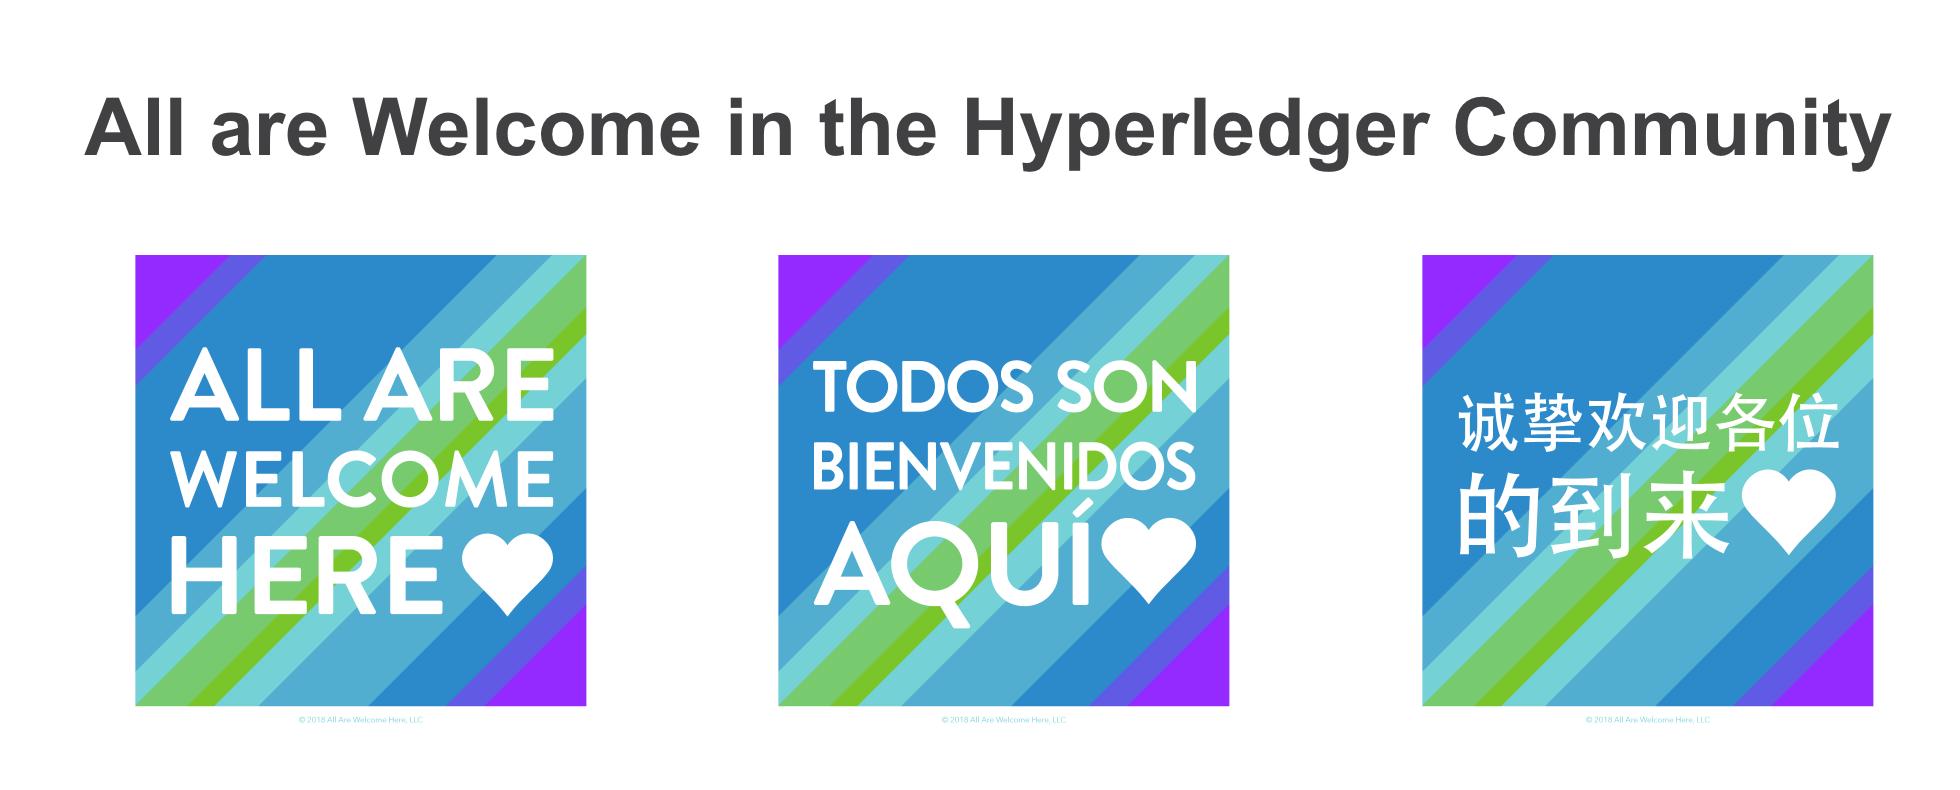 2019-10-30 - Identity Working Group - Hyperledger Confluence